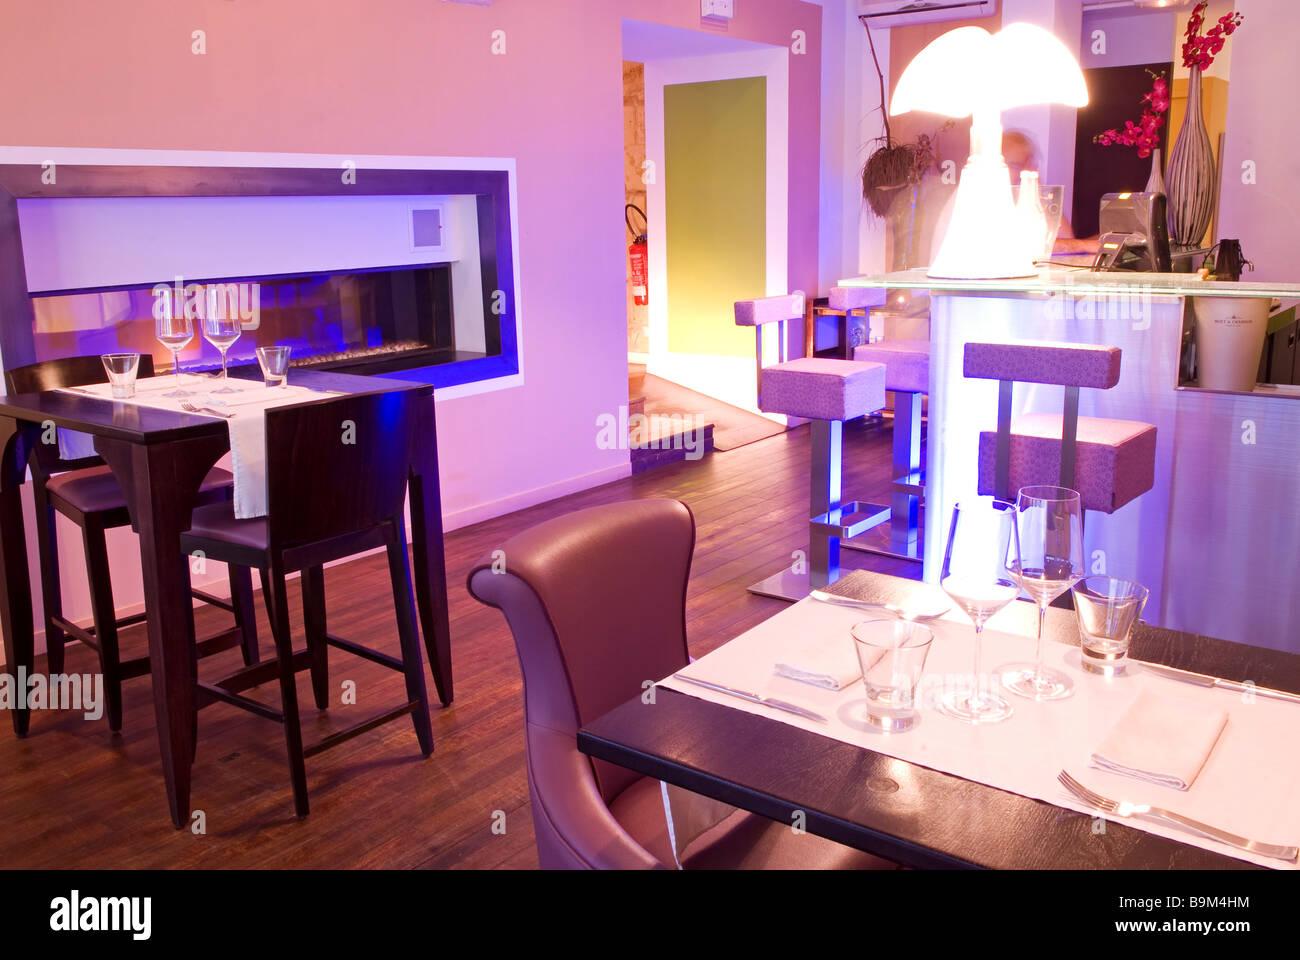 france gironde bordeaux saint pierre district le karma restaurant stock photo royalty free. Black Bedroom Furniture Sets. Home Design Ideas